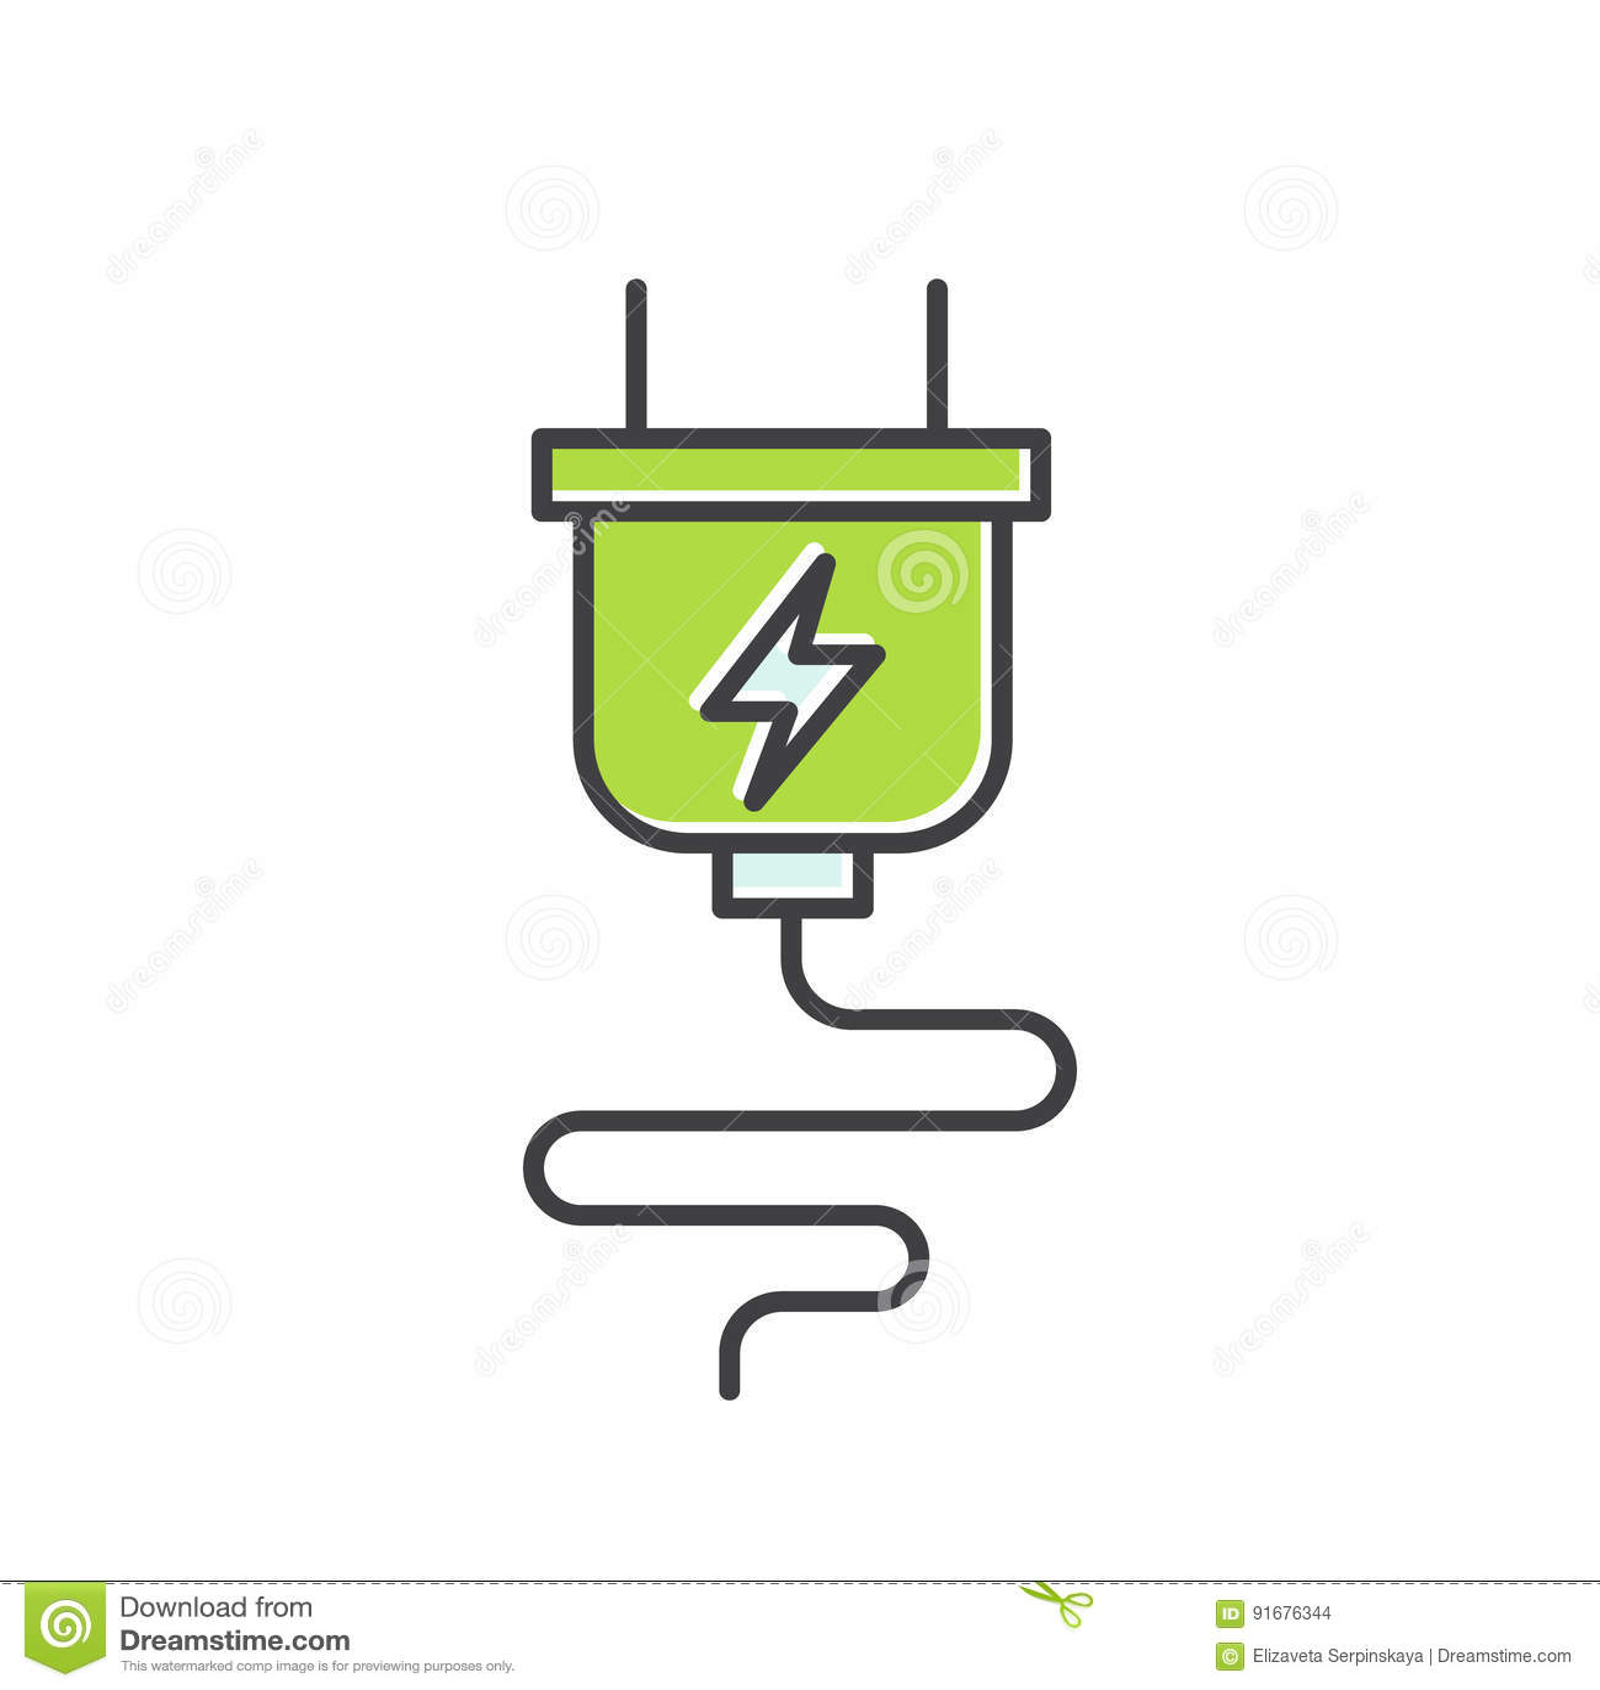 Ziemlich Symbol Ladegerät Galerie - Elektrische Schaltplan-Ideen ...